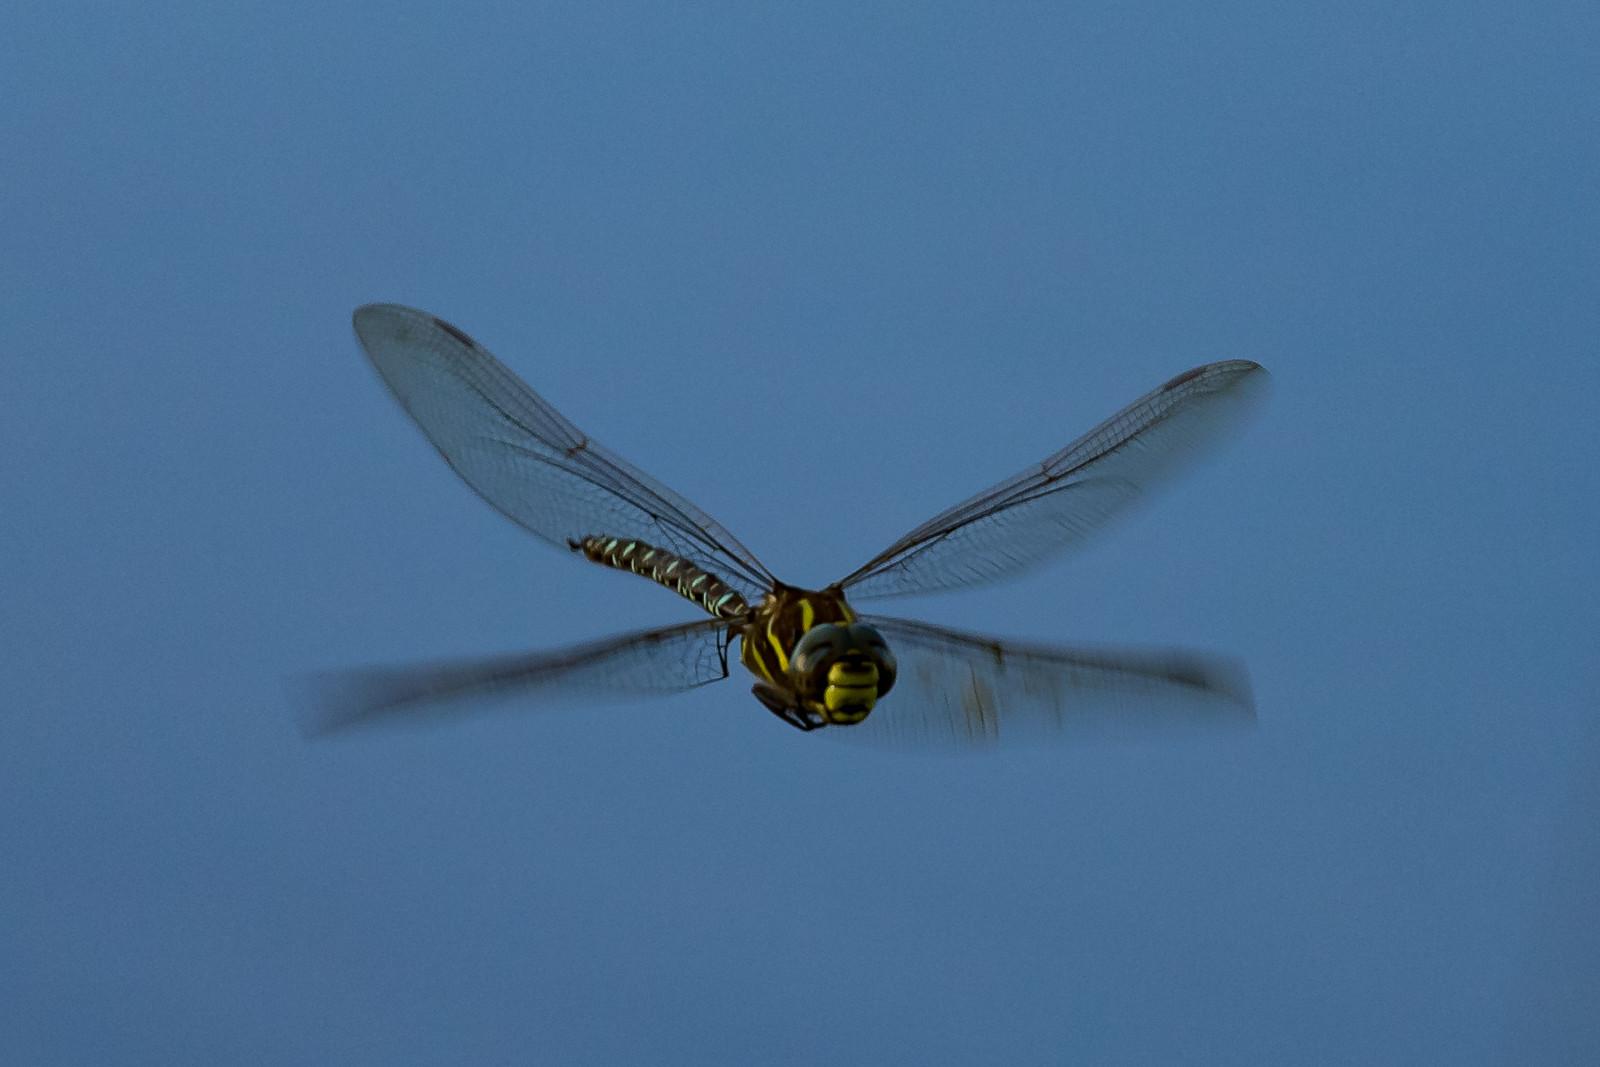 Aeshna juncea, Sivmosaikguldsmed, Moorland Hawker. Male.